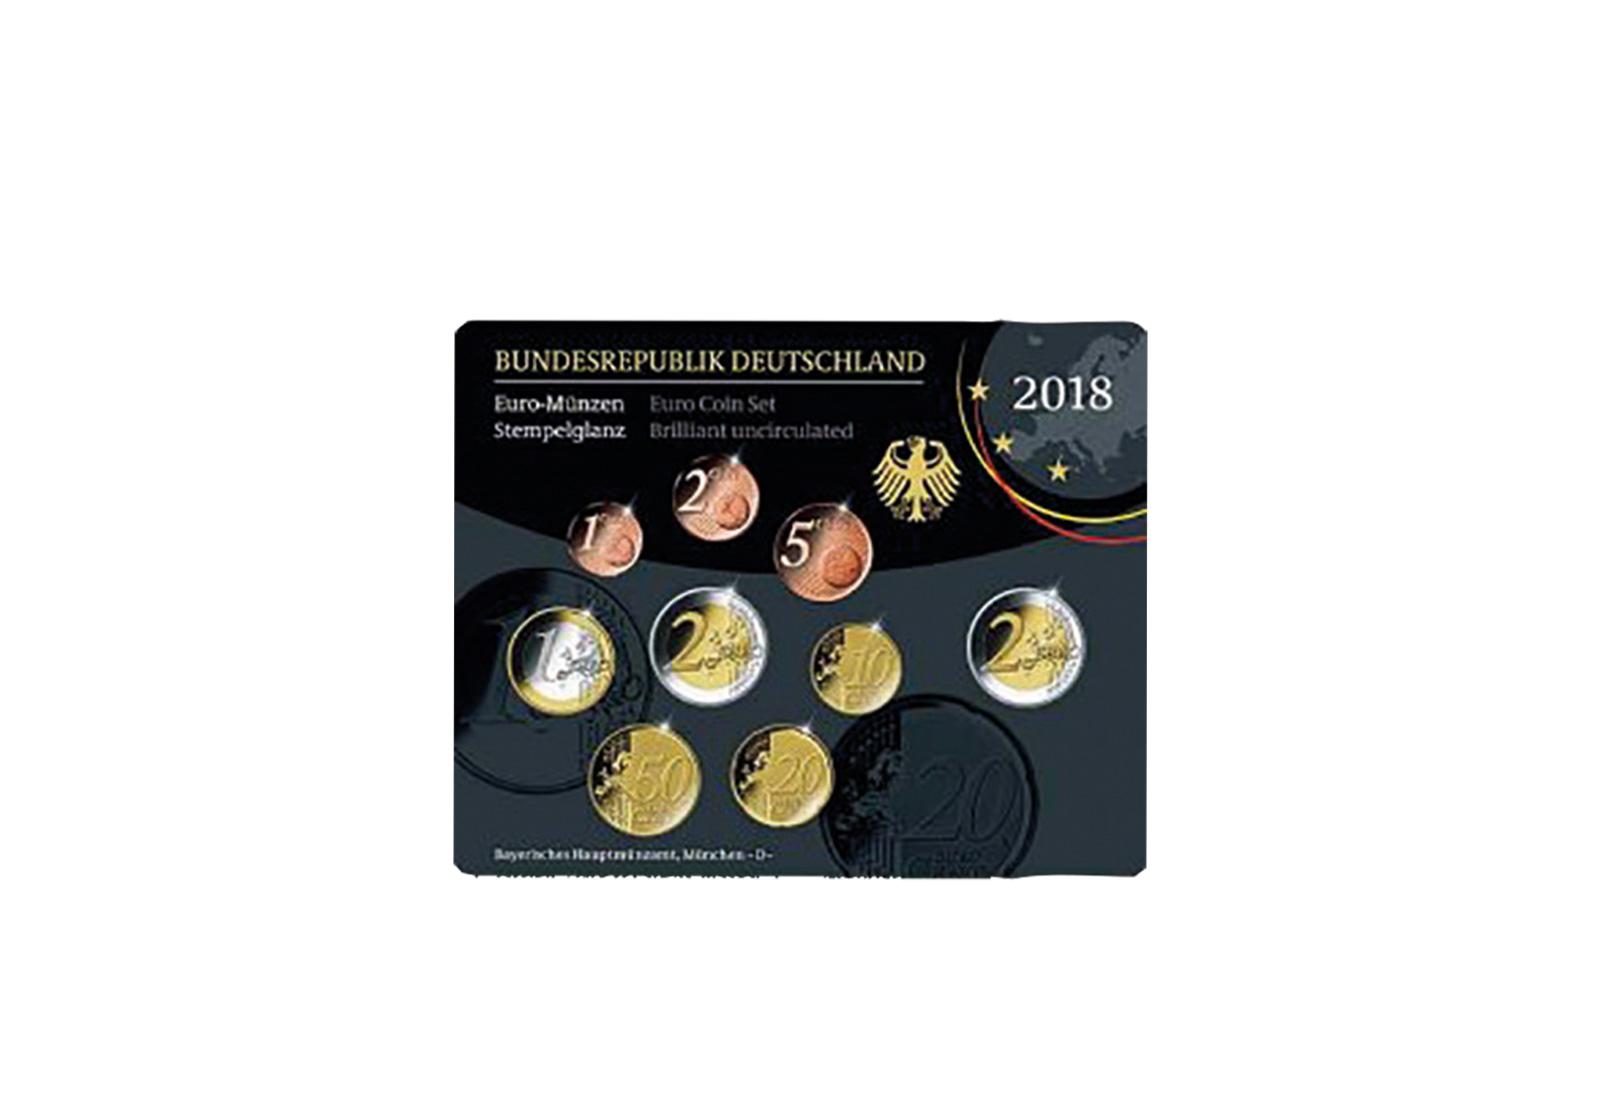 Brd Kursmünzensatz 2018 St Prägestätte D München Euro